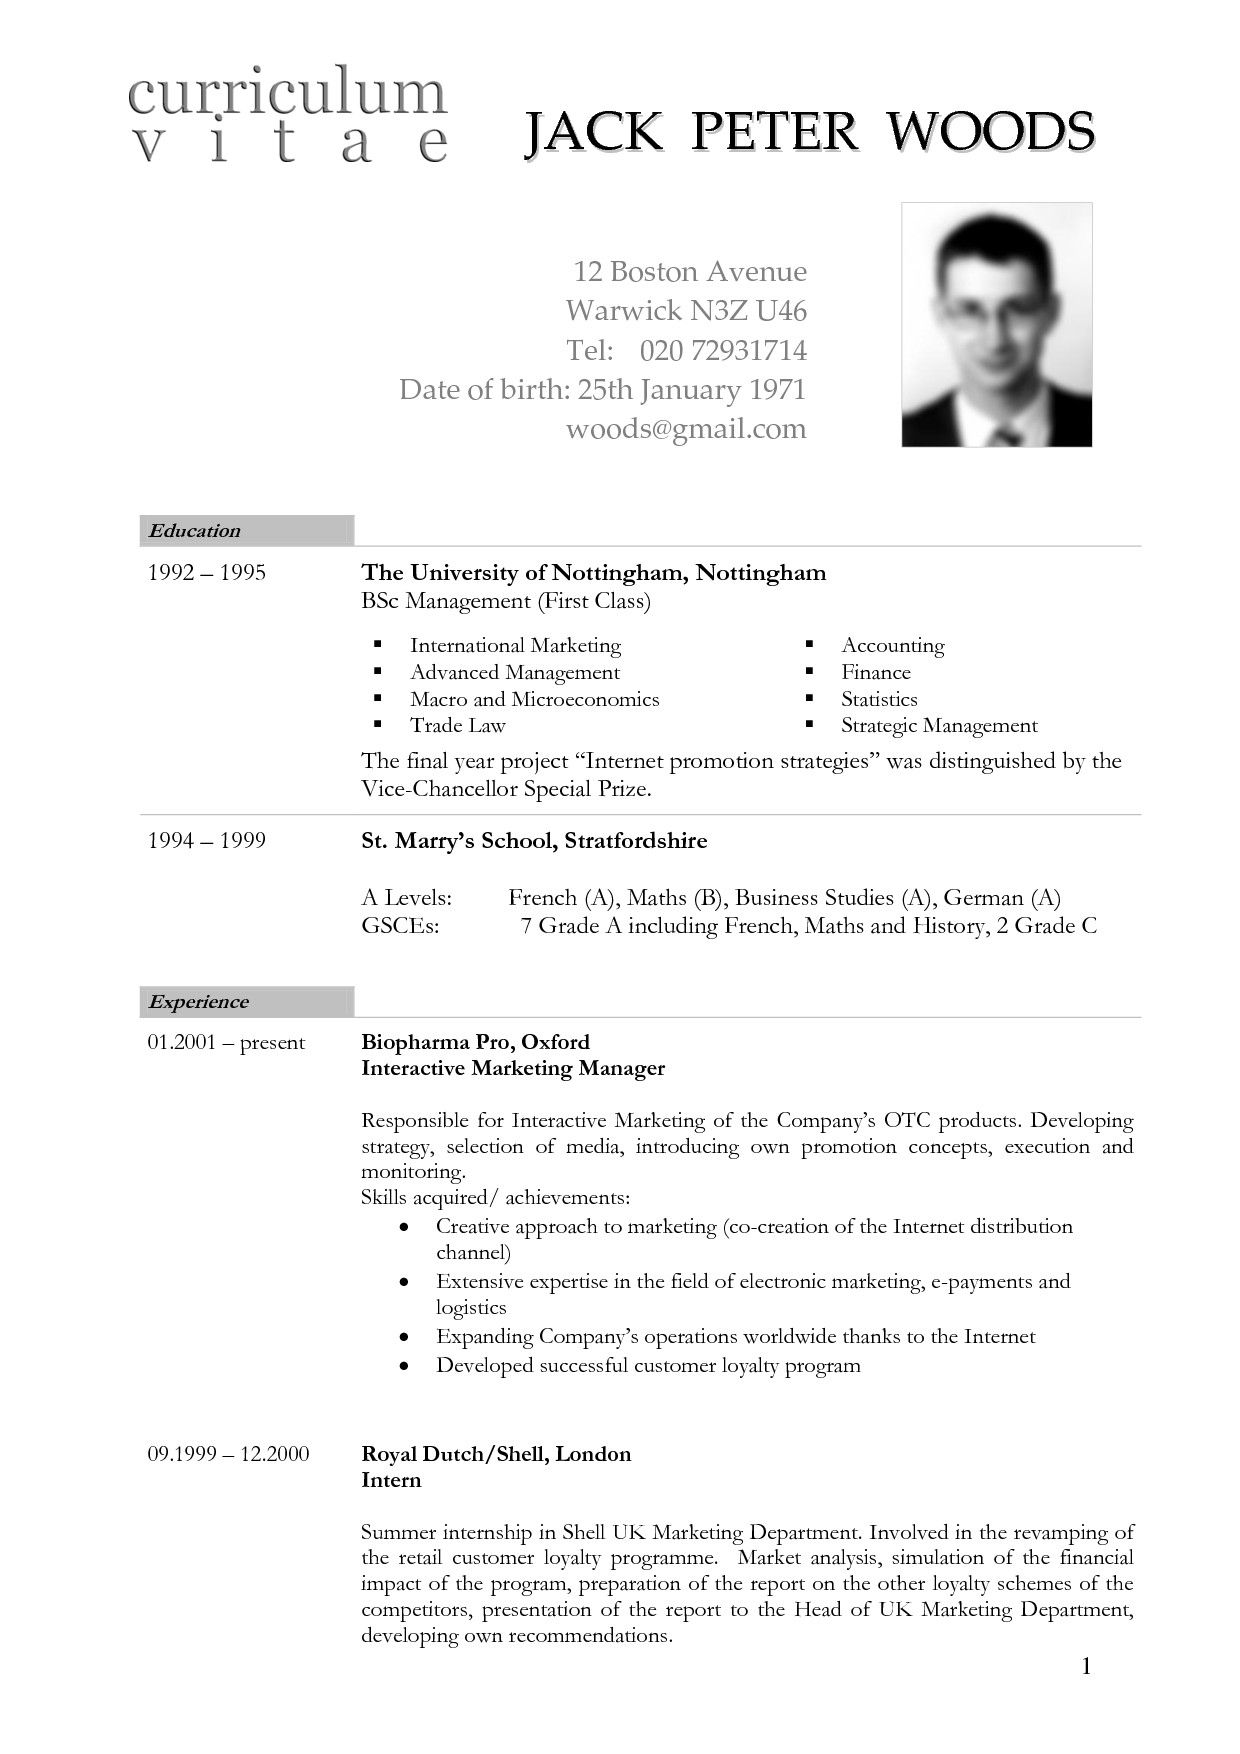 Cv Template Germany - Resume Format  Curriculum vitae